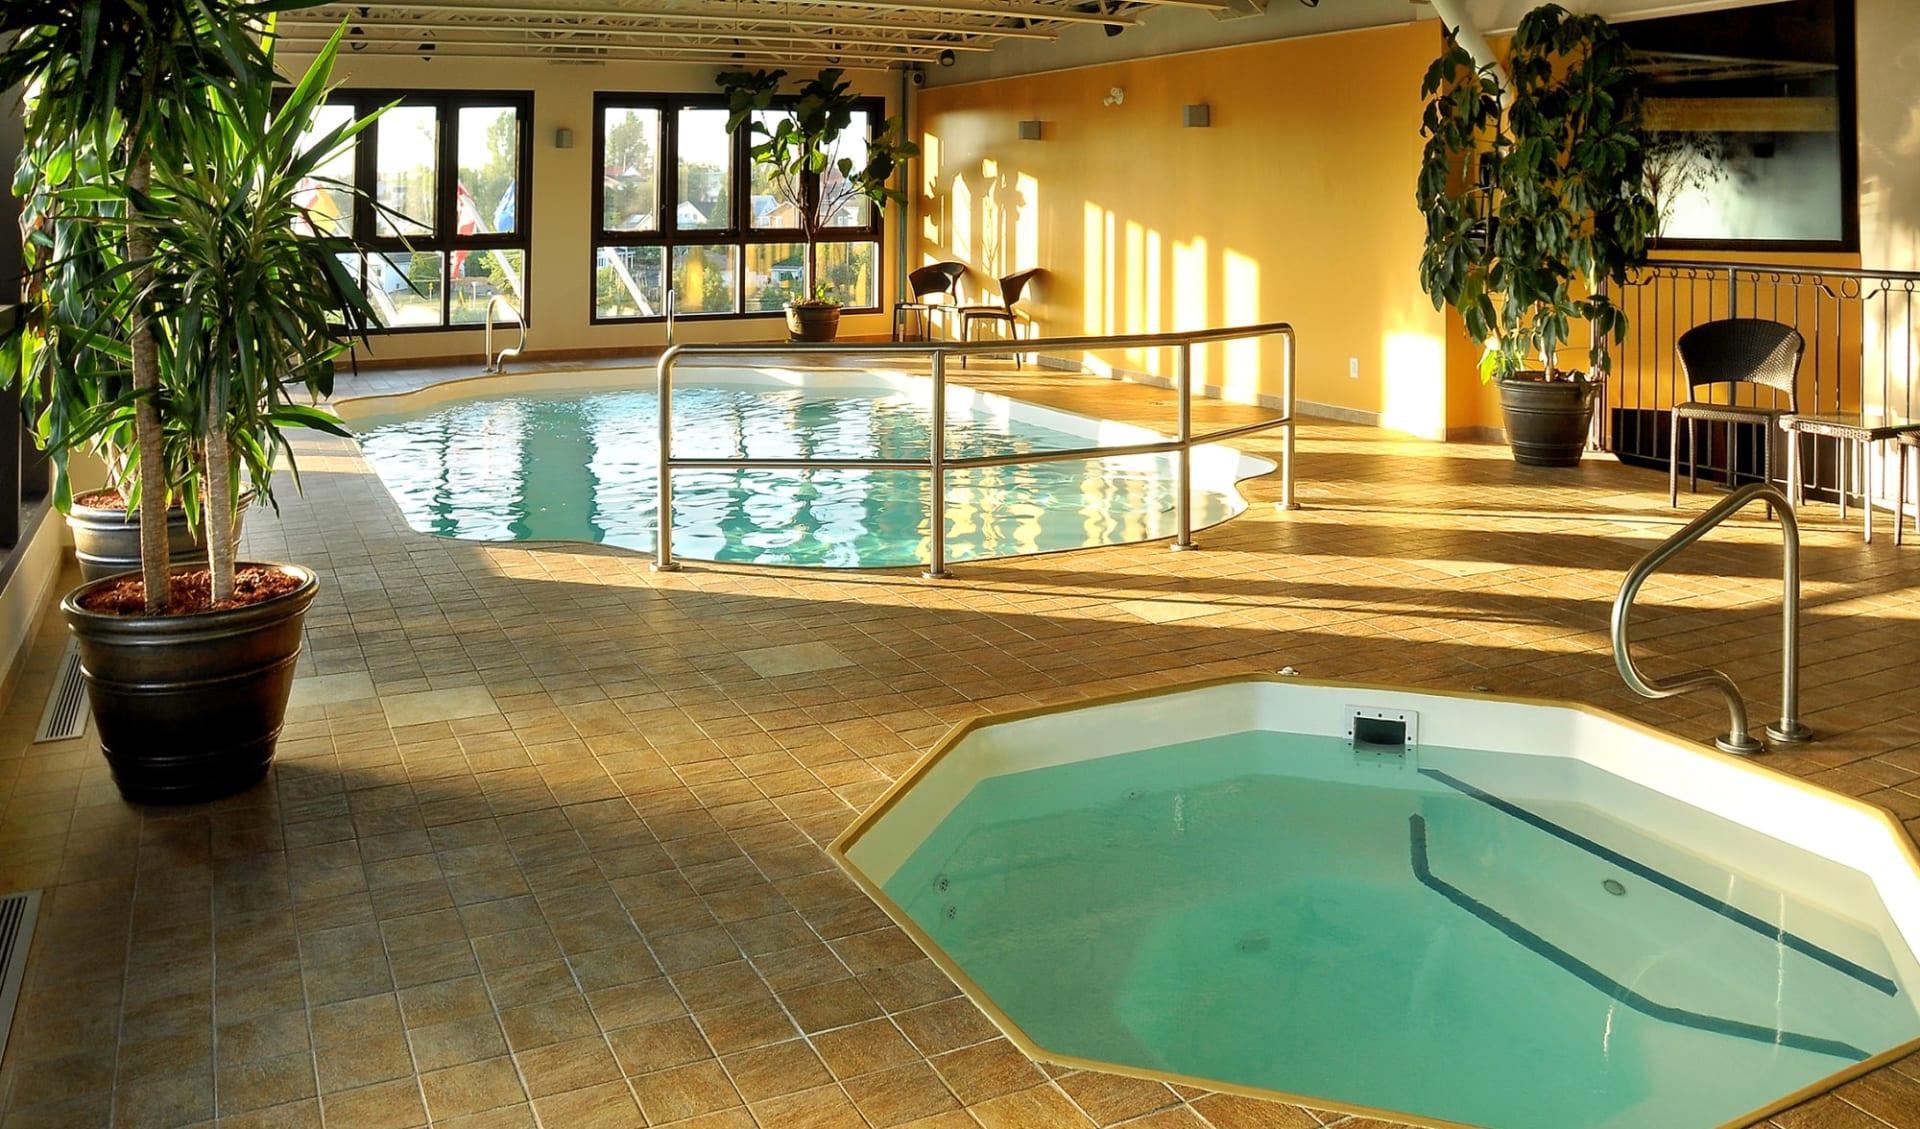 Hotel Universel in Alma: Facilities_Hotel Universel_Pool_Jonview